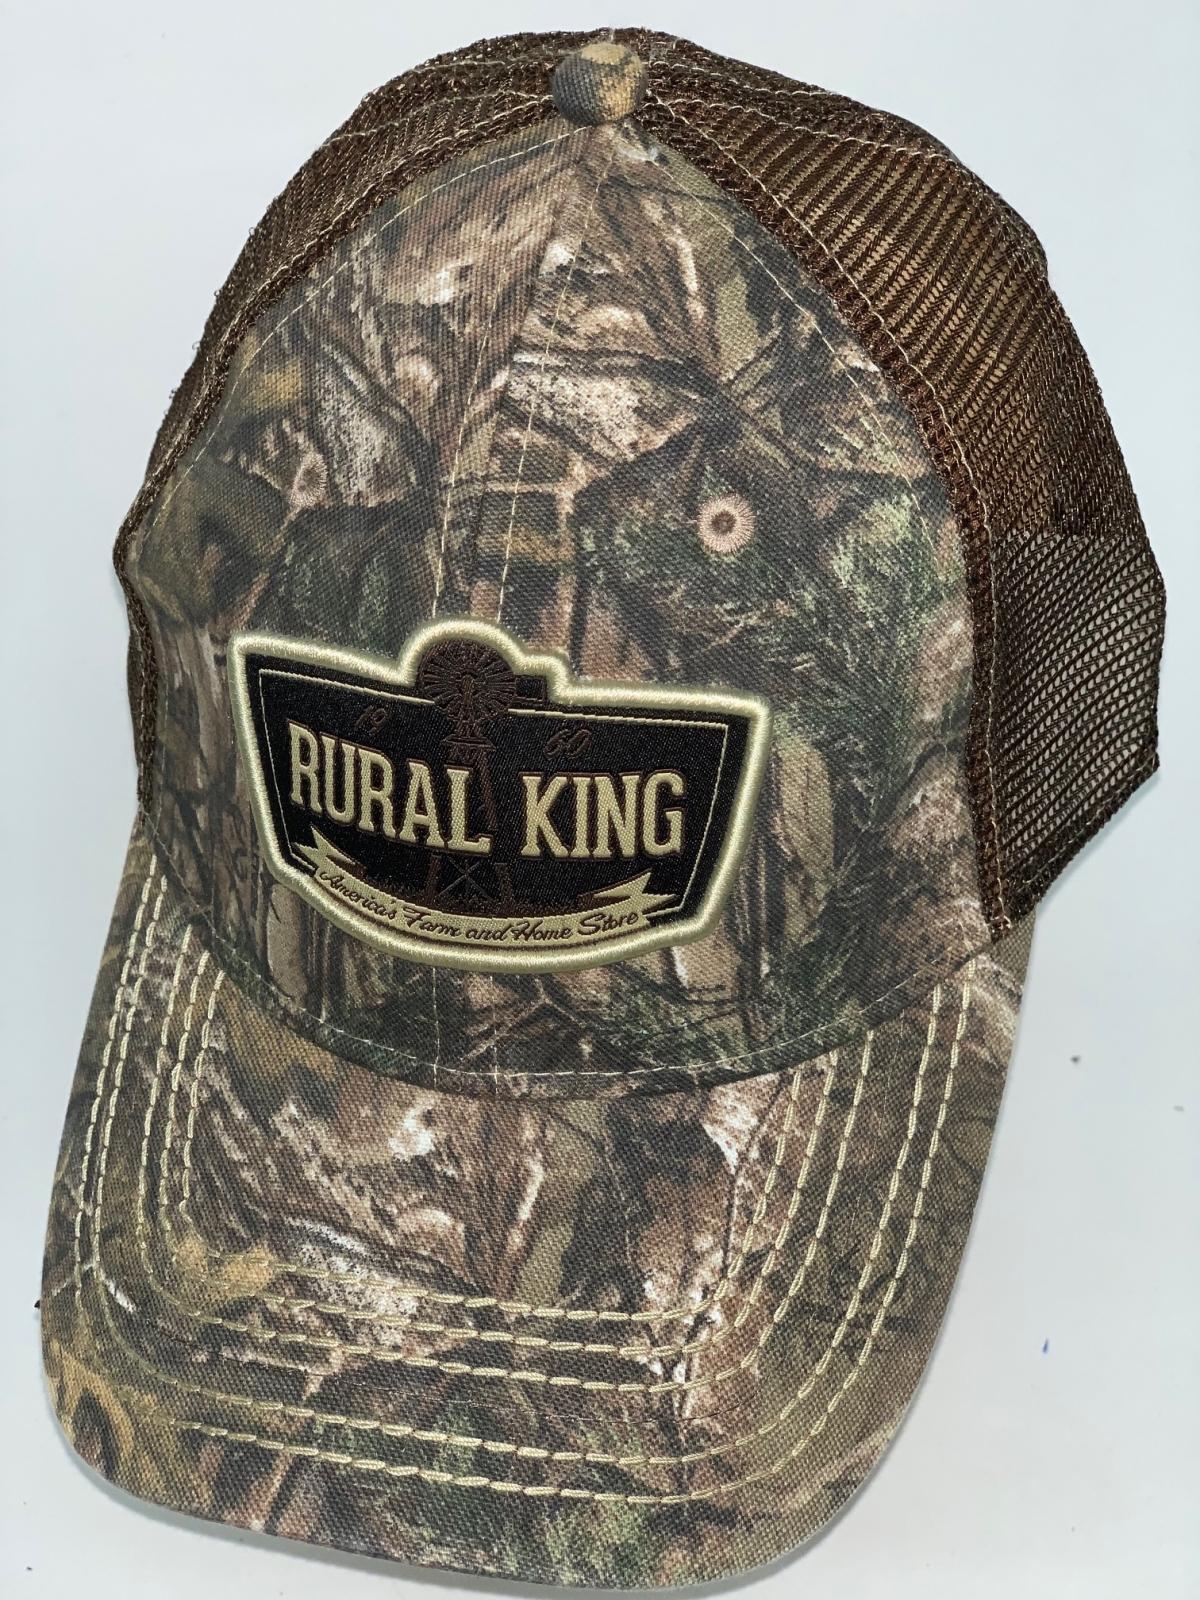 Камуфляжная бейсболка Rural King с сеткой